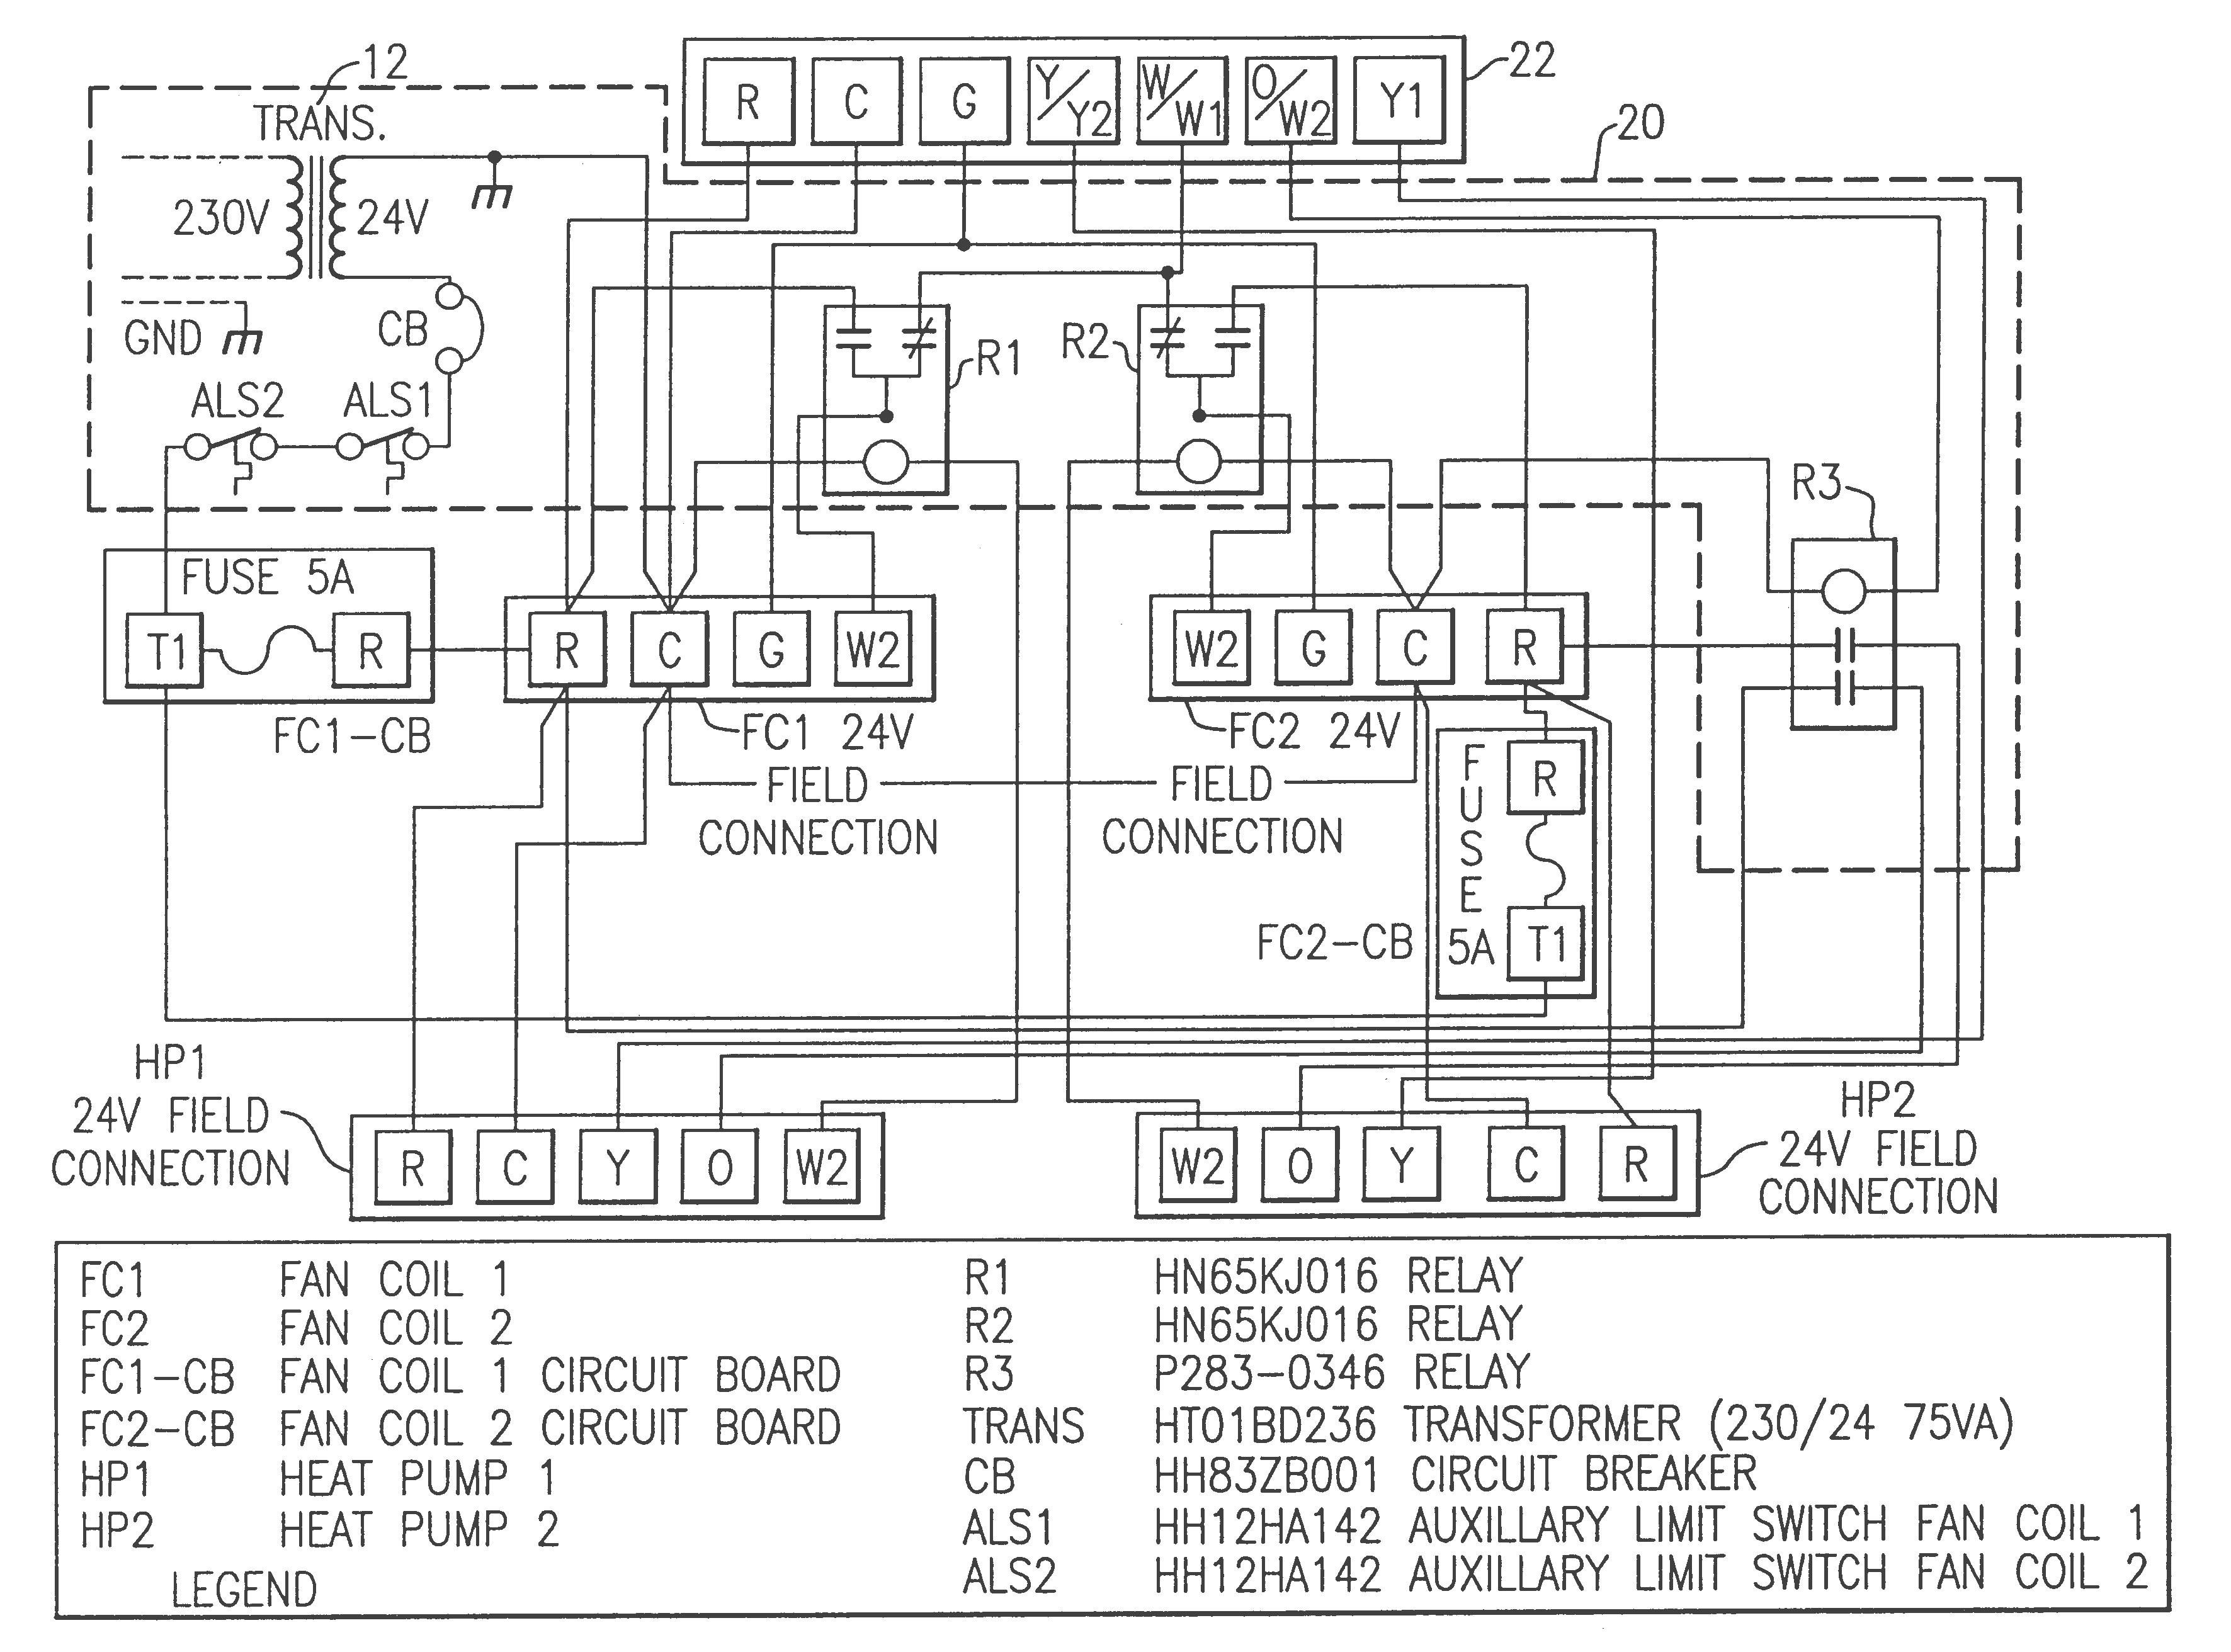 goodman wiring diagram ez go electric golf cart package heat pump library unit sample refrigerator start relay